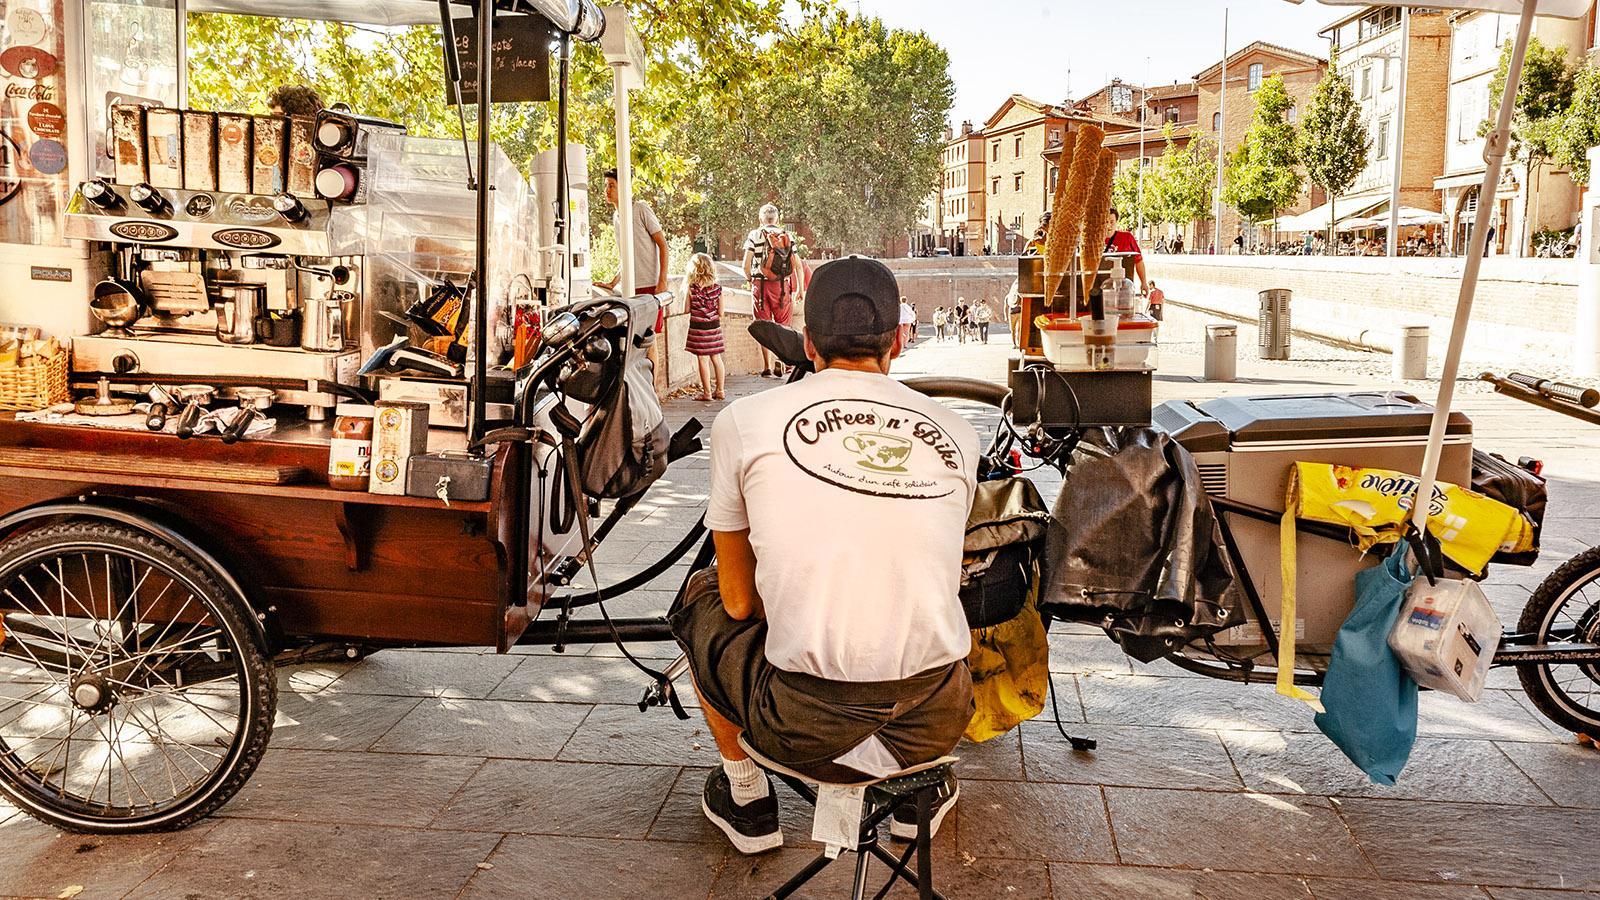 Am Garonne-Kai verkauft ein mobiles Fahrradcafé frisch gebrühten Kaffee. Foto: Hilke Maunder